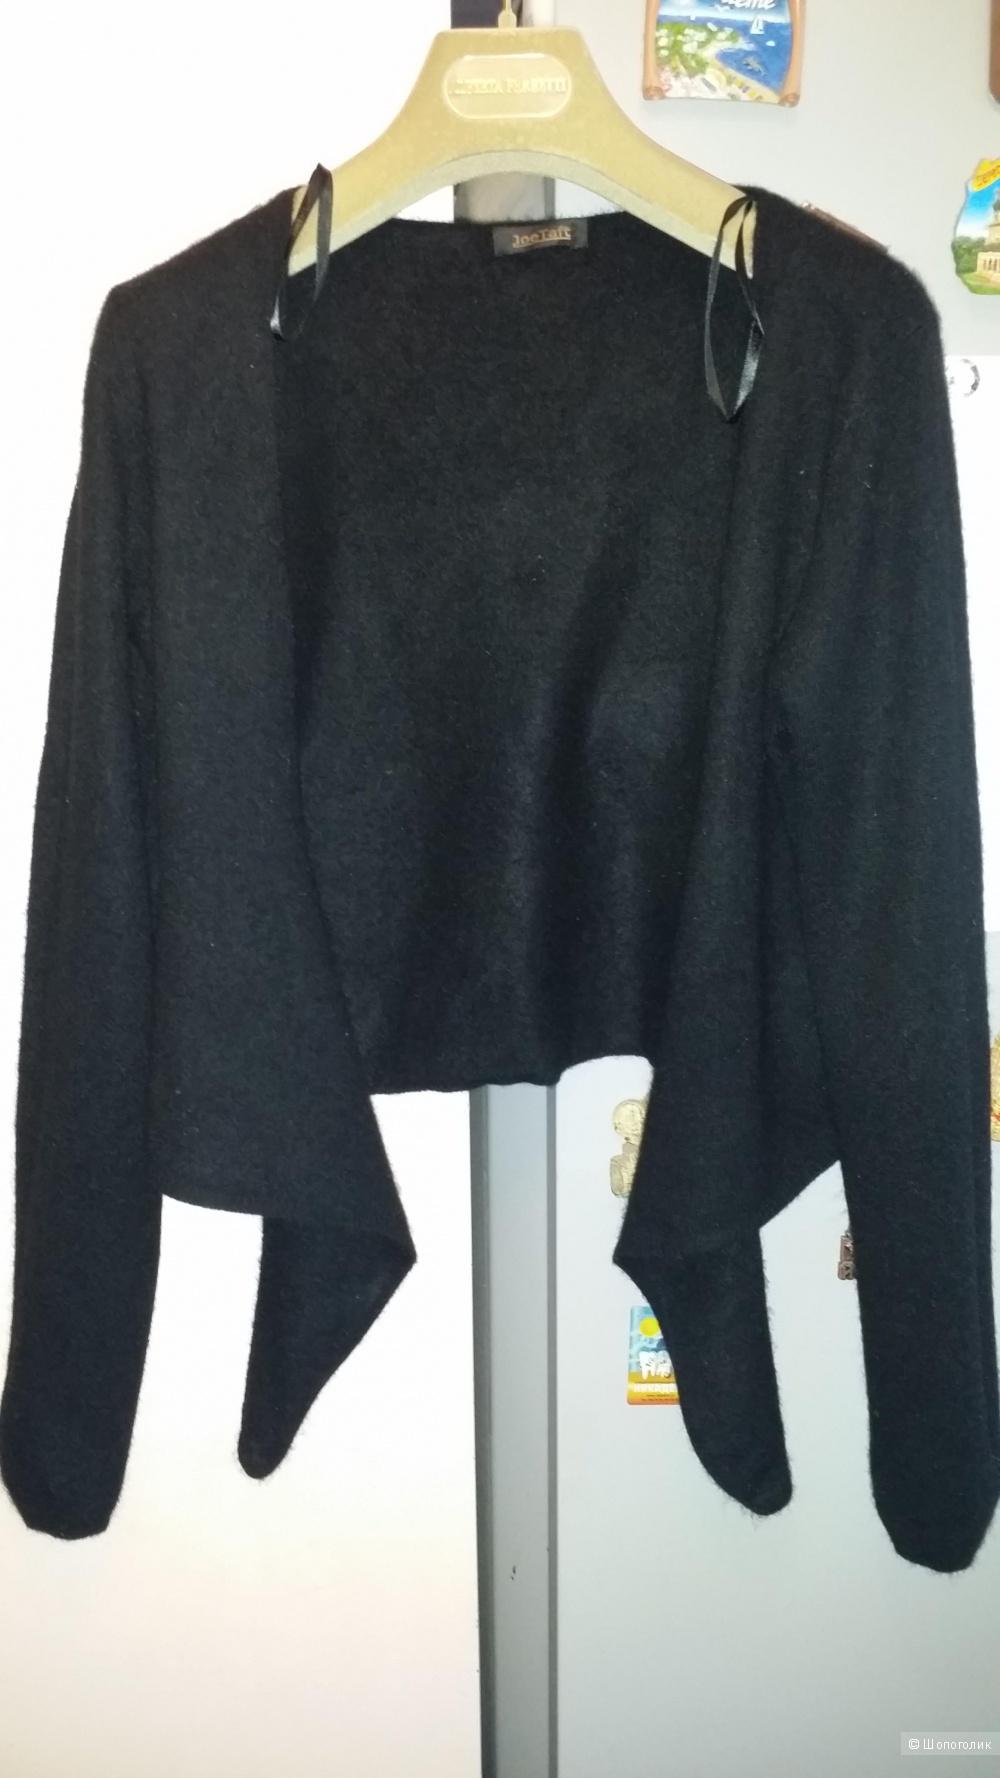 JOE TAFT Cashmere , кашемировый кардиган, 44-46 размер